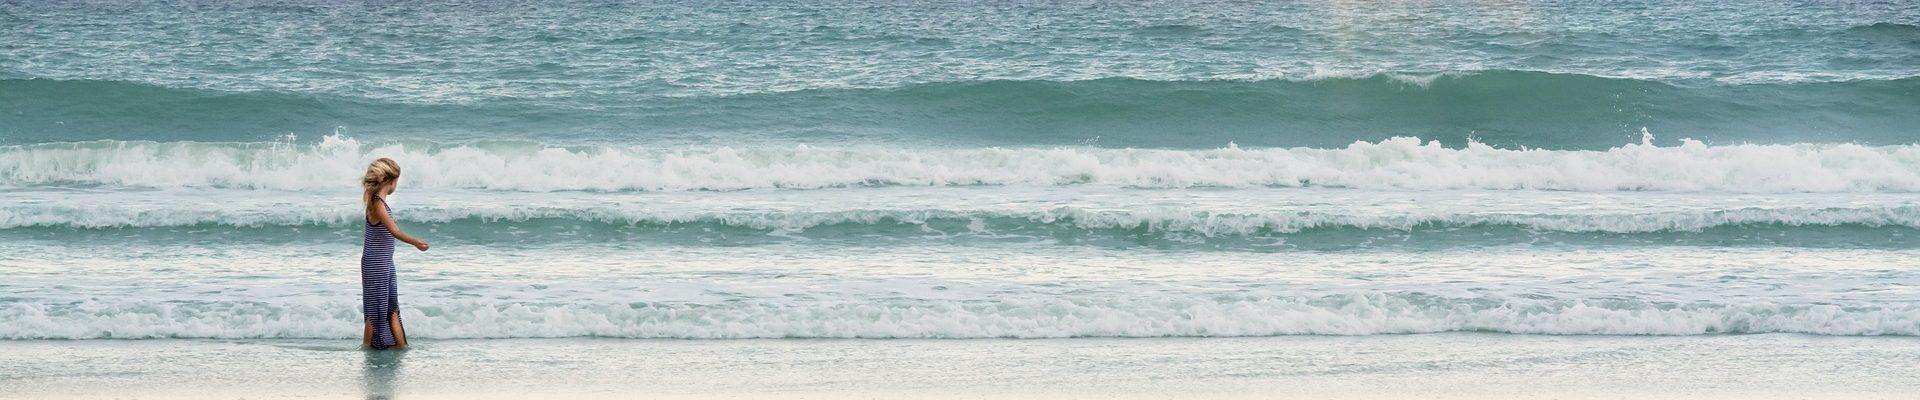 ocean-931776_1920